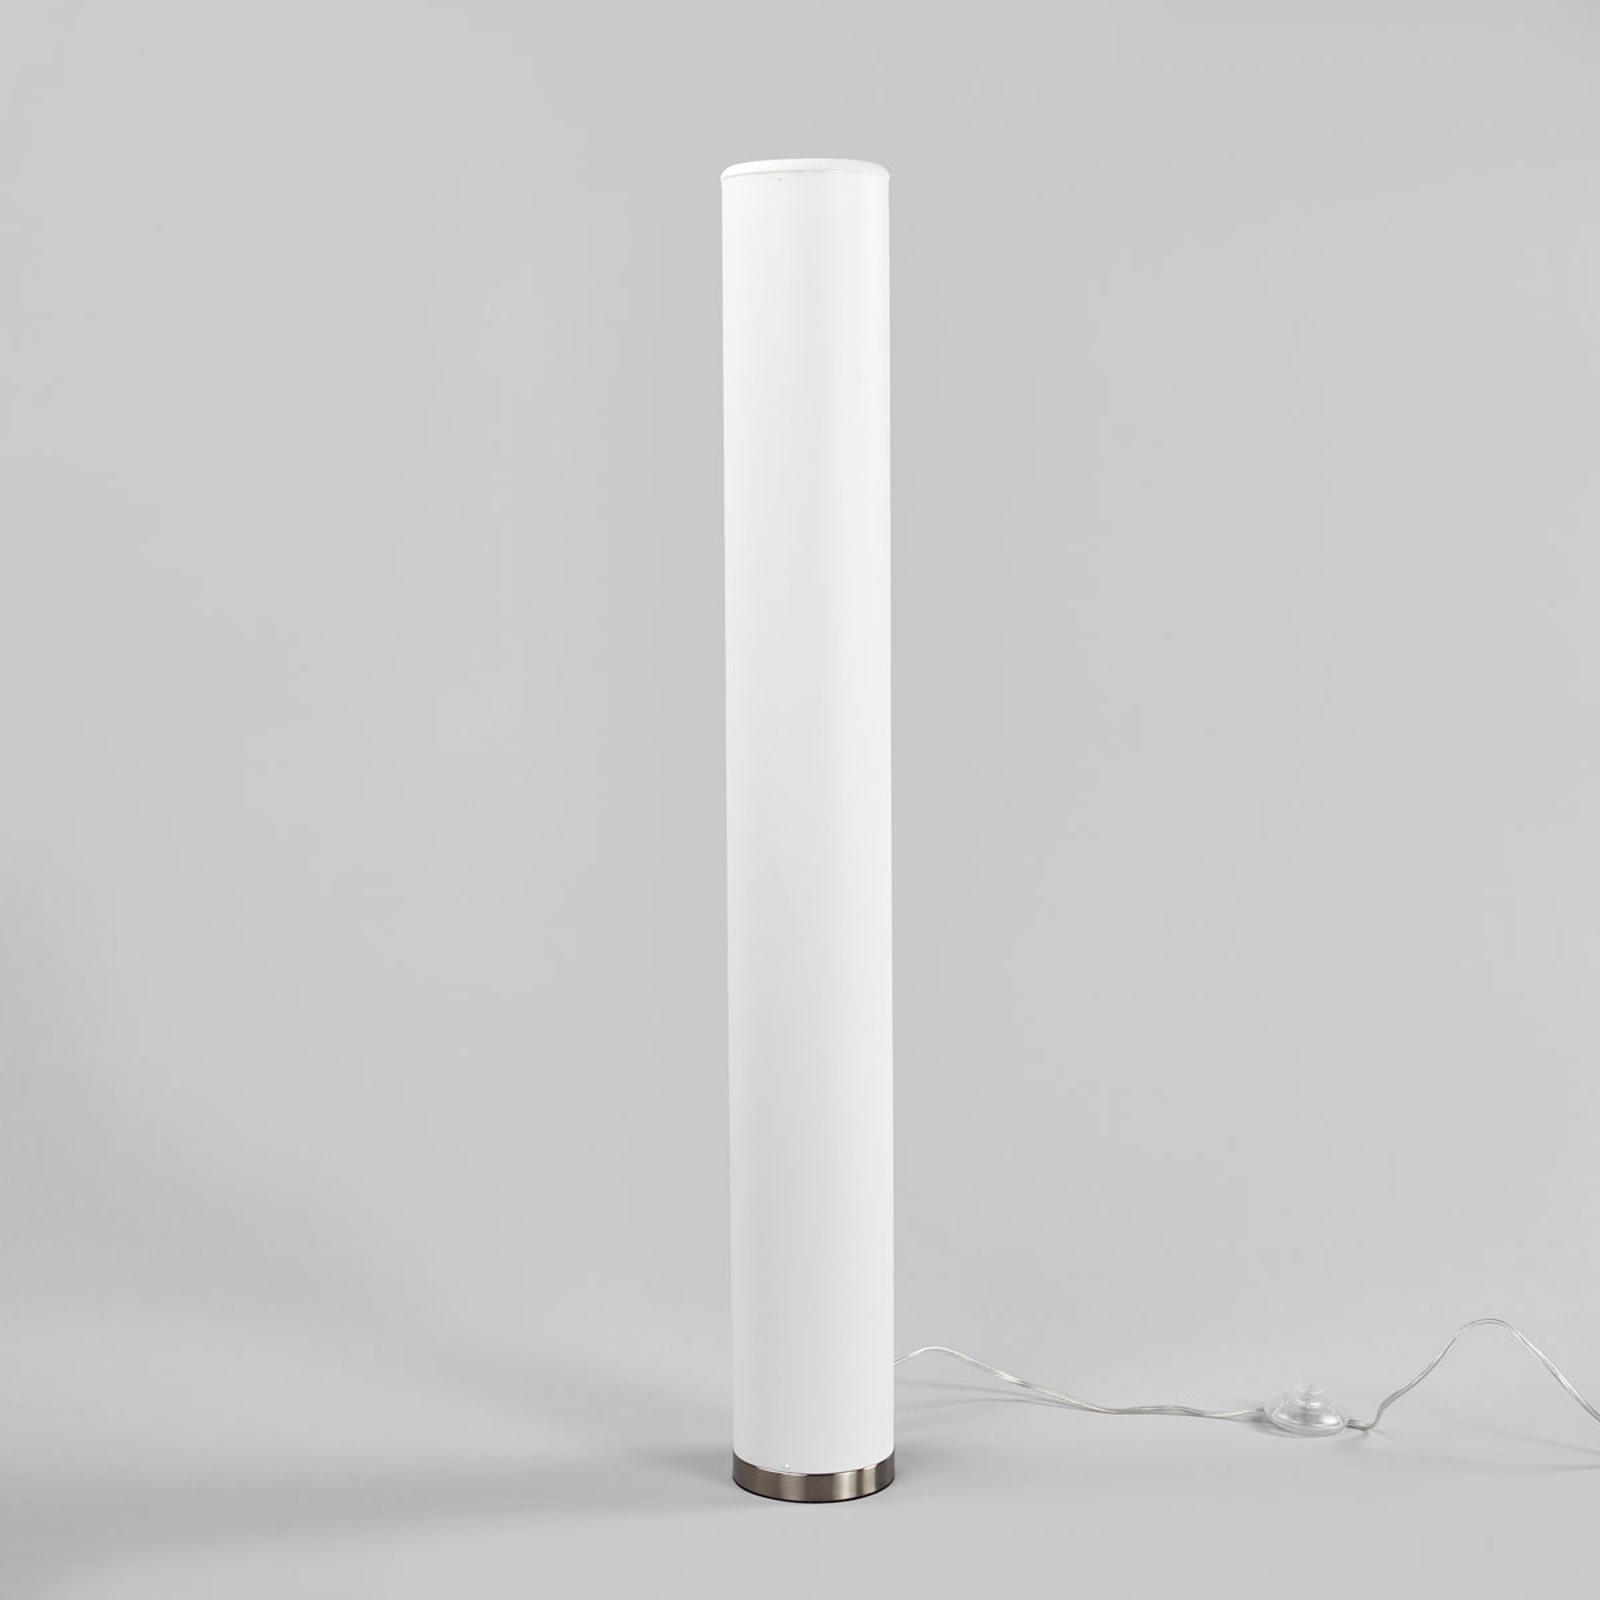 Stehlampe Glas Bunt